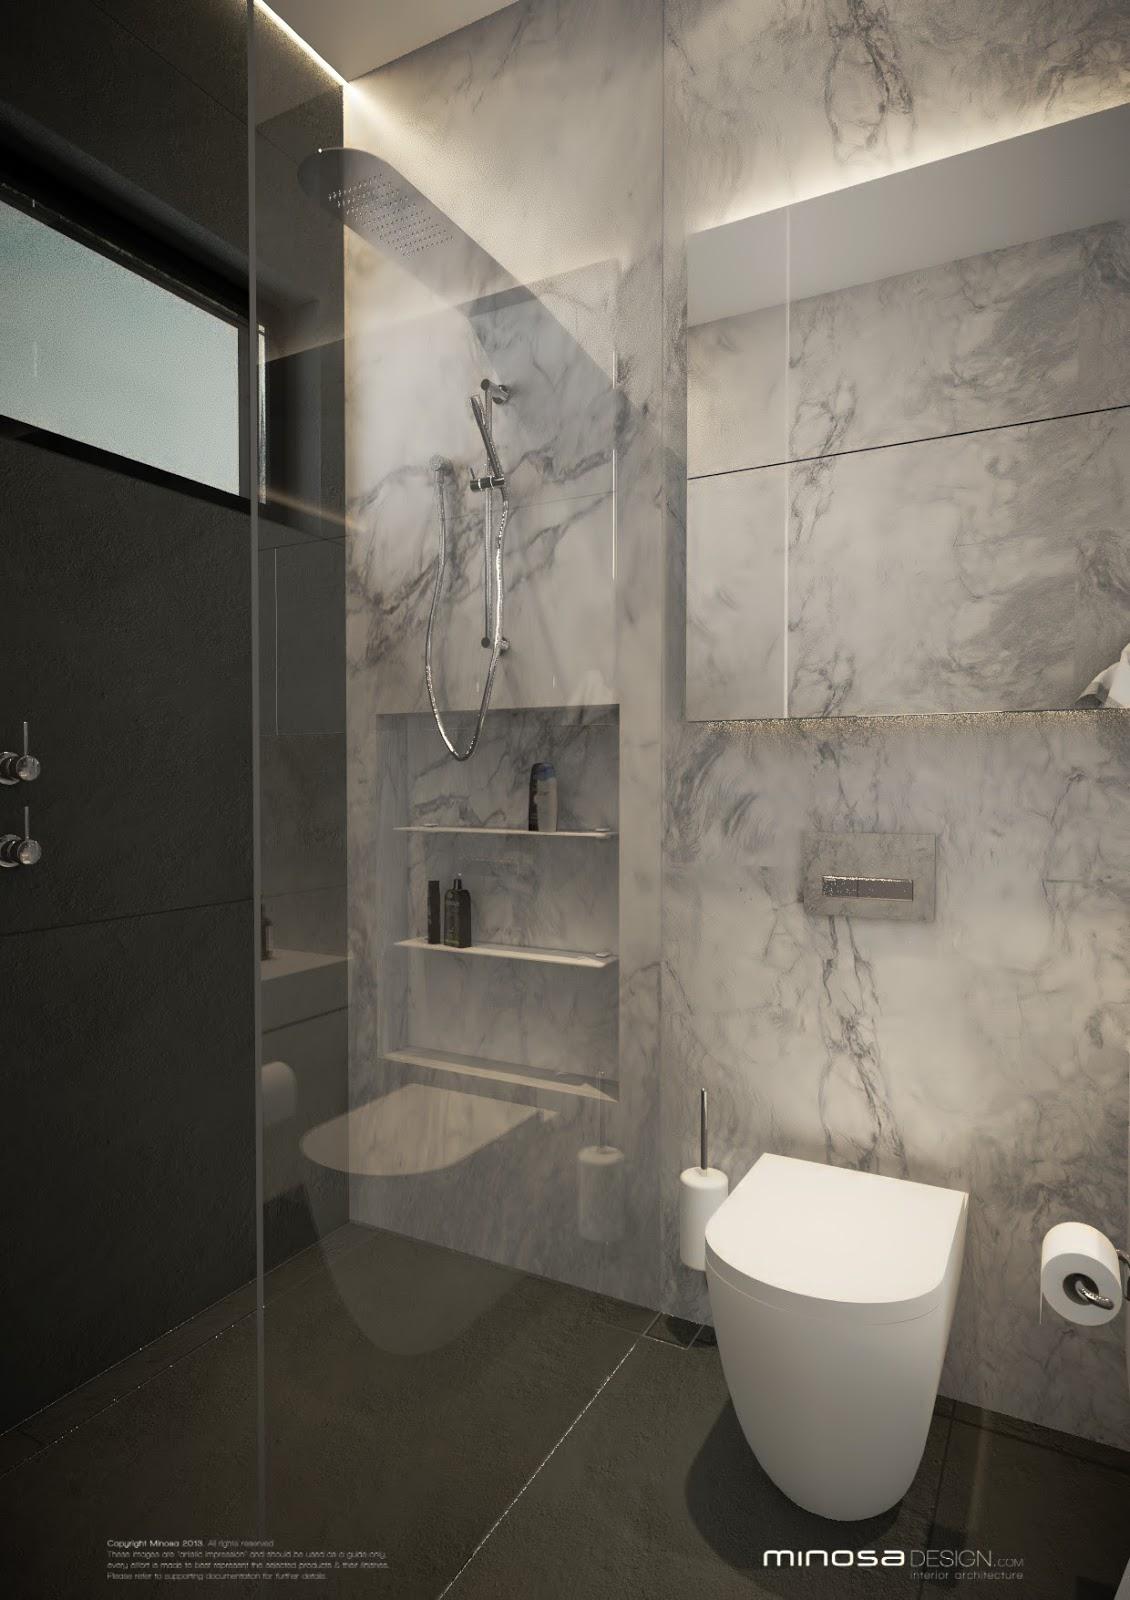 Minosa: Modern Monochrome Bathroom Design on Monochromatic Bathroom Ideas  id=45699